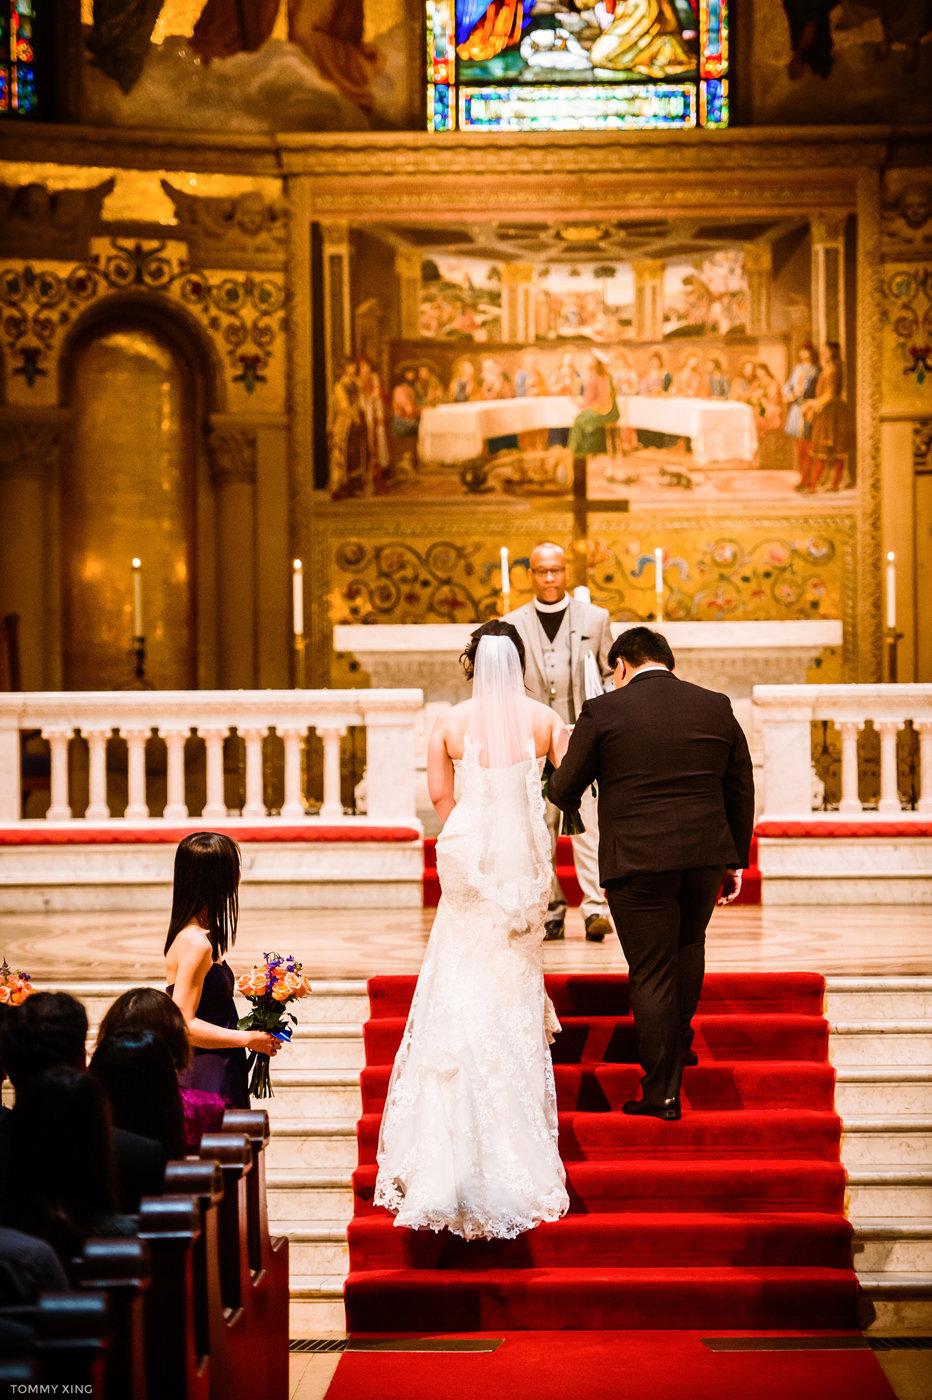 STANFORD MEMORIAL CHURCH WEDDING - Wenjie & Chengcheng - SAN FRANCISCO BAY AREA 斯坦福教堂婚礼跟拍 - 洛杉矶婚礼婚纱照摄影师 Tommy Xing Photography092.jpg